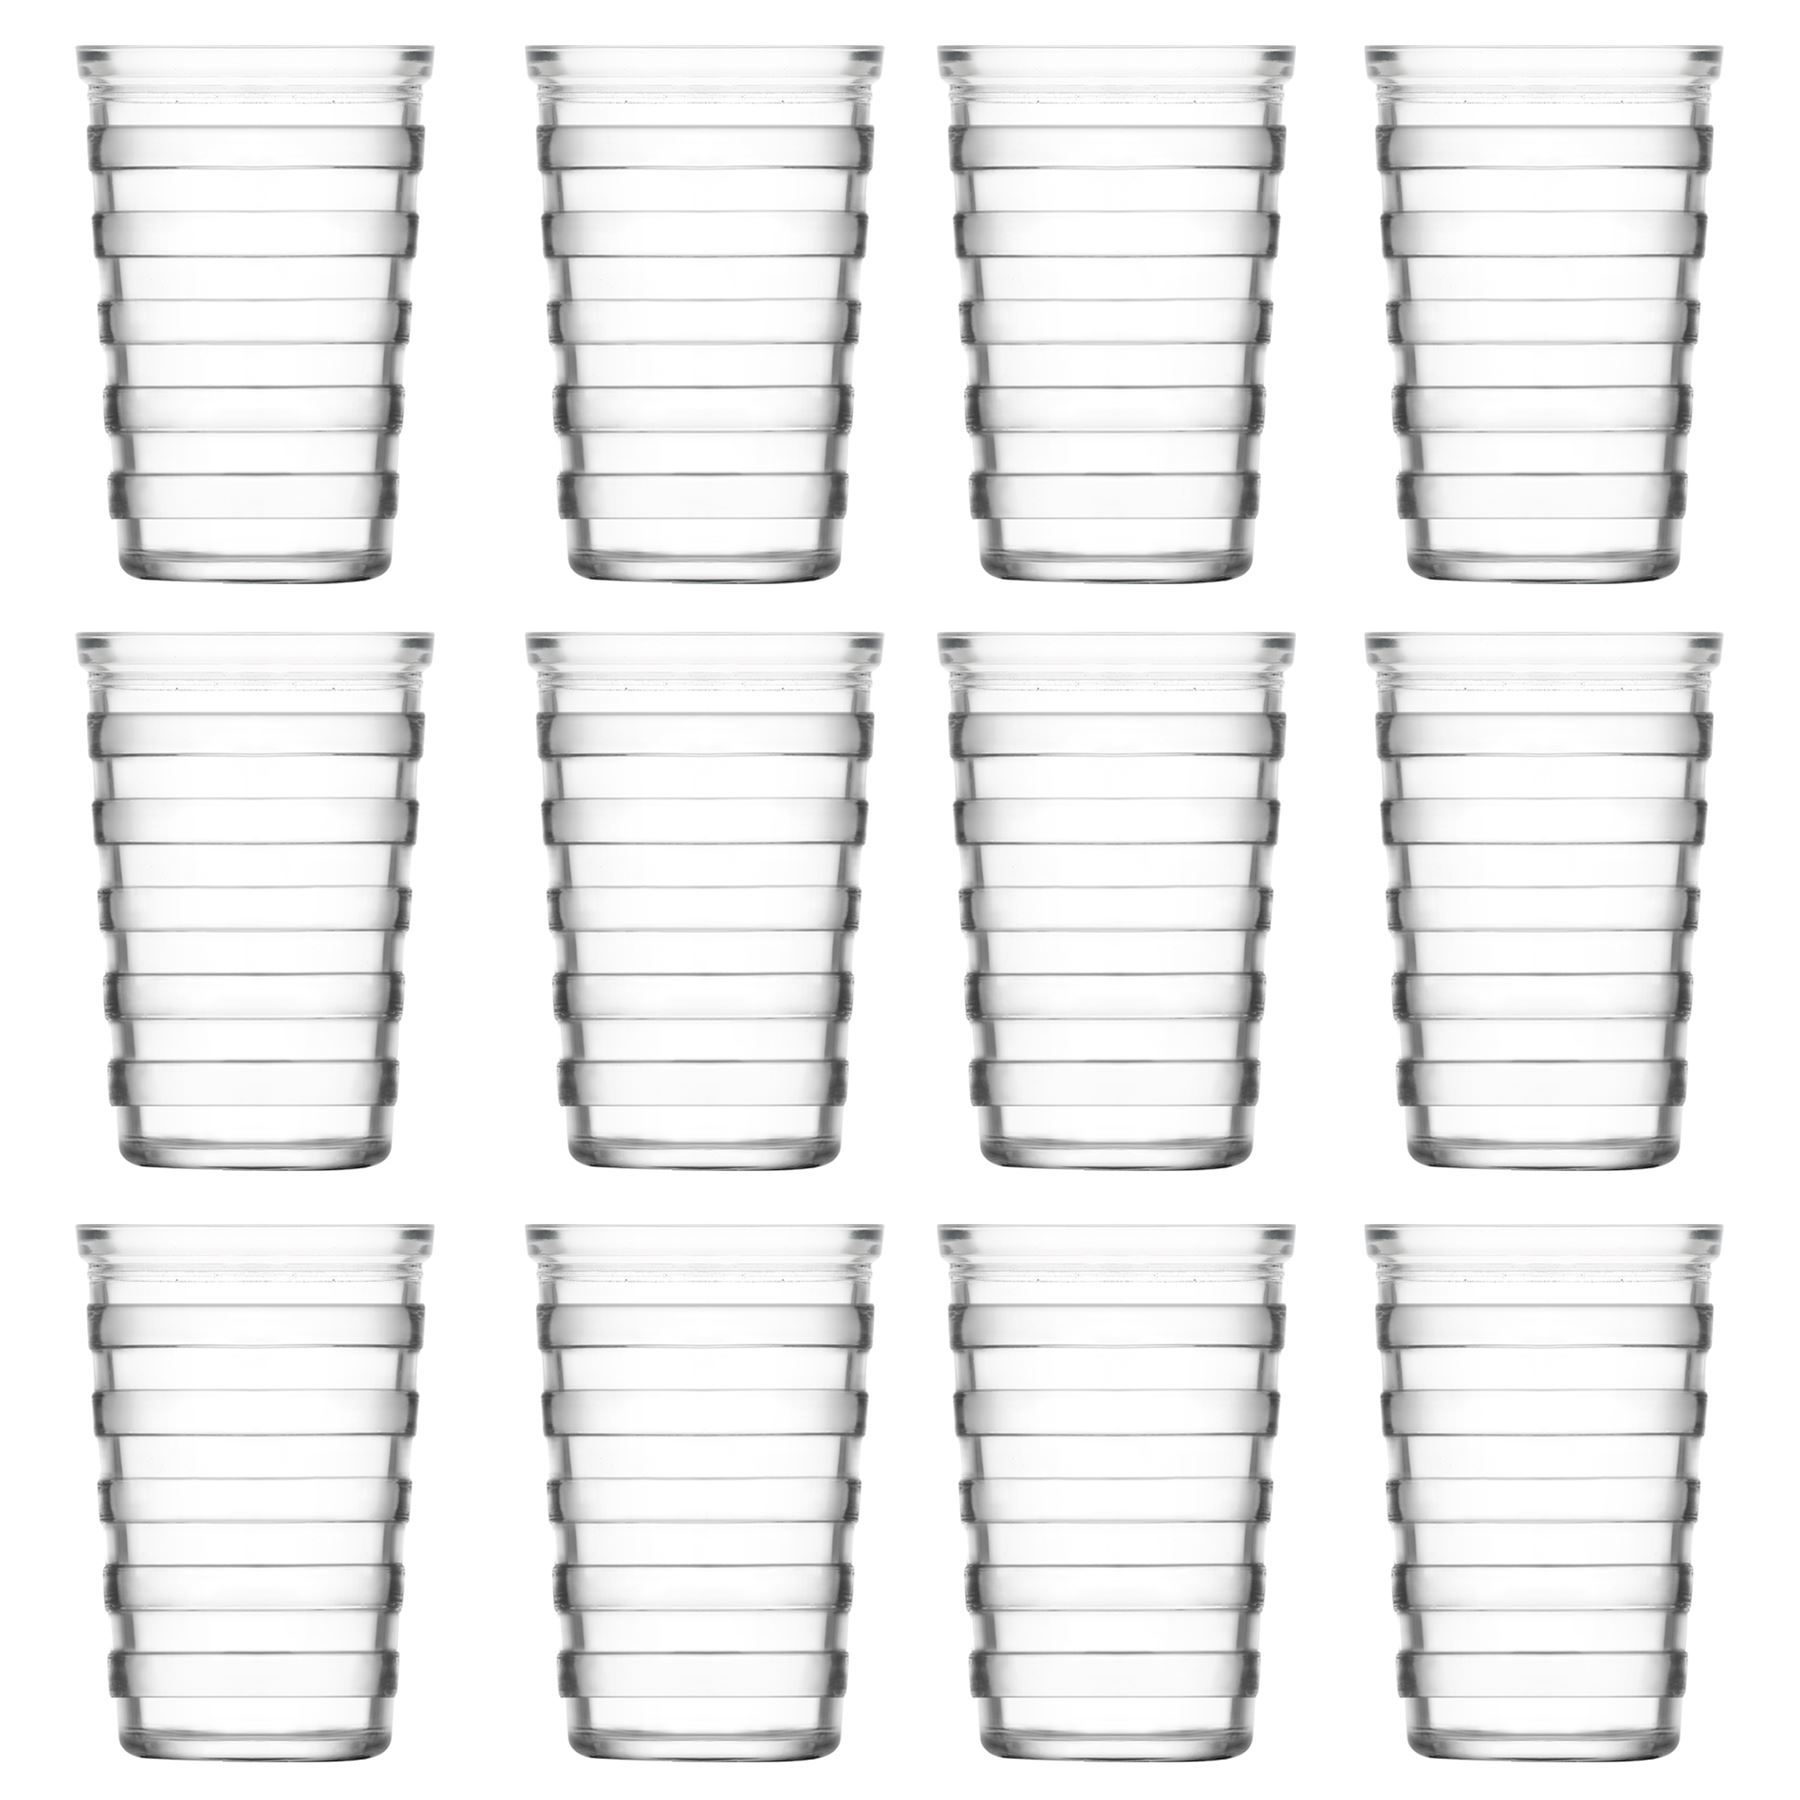 Stripe Water Whisky Juice Tumbler Drinking Glasses